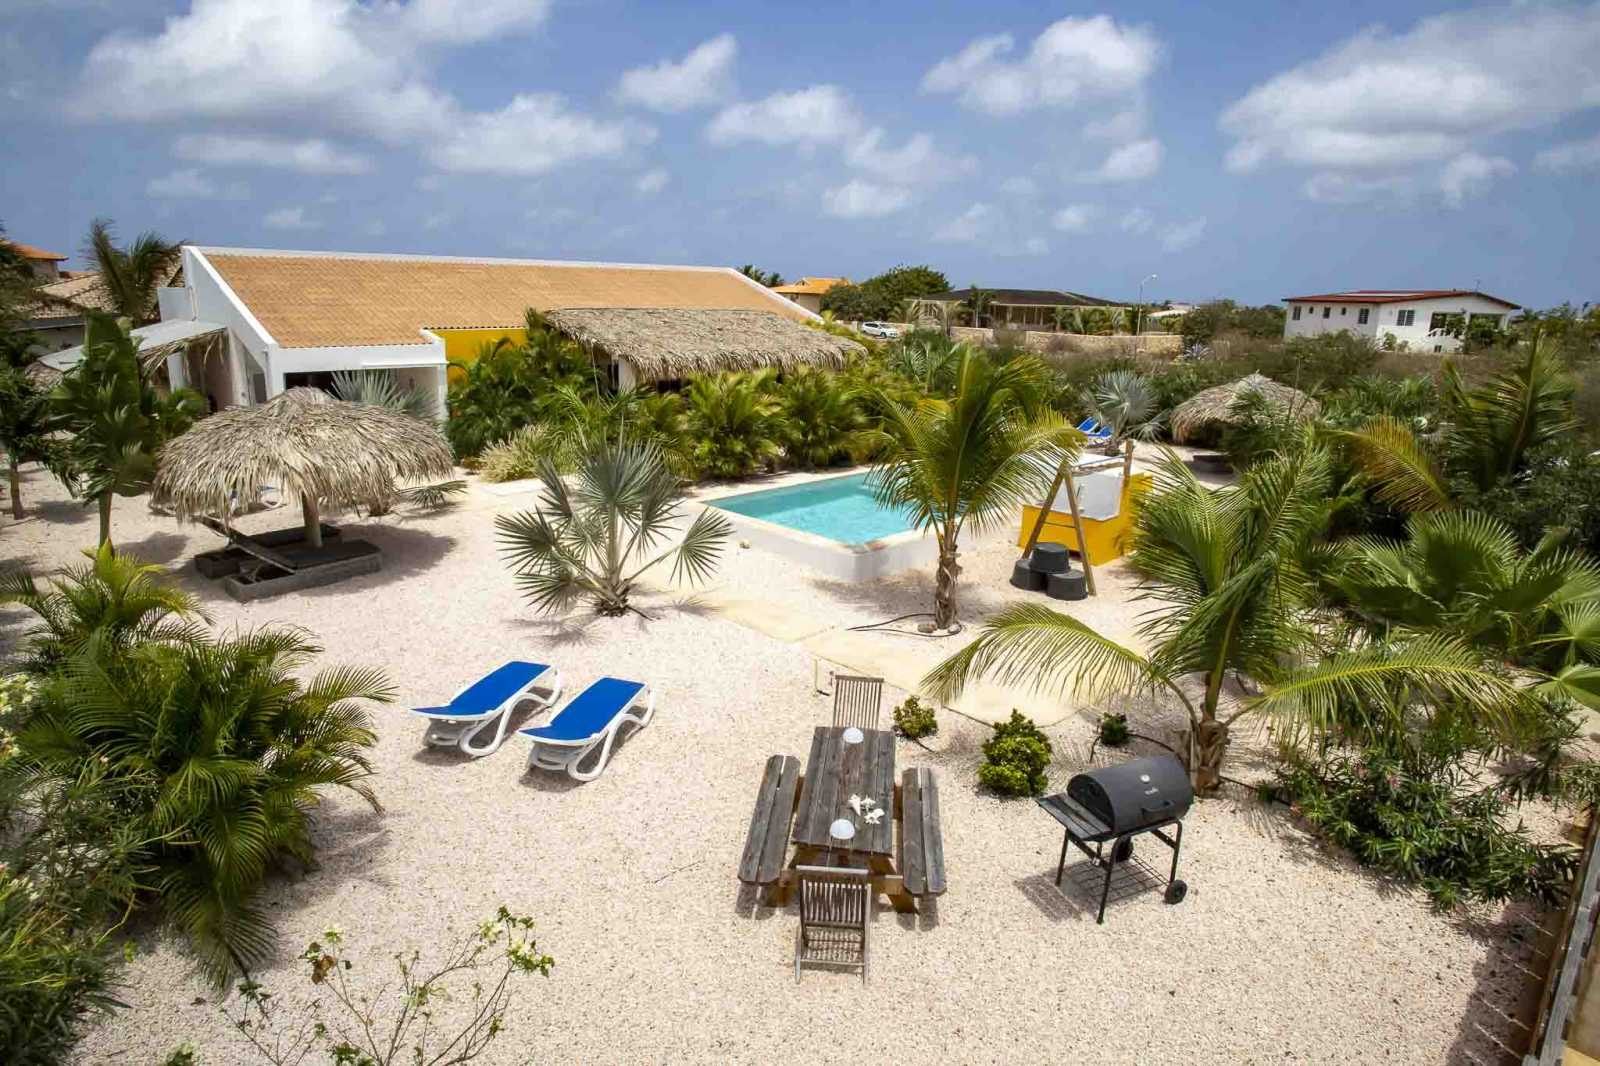 Luxury Villa Apartments for rent Bonaire - Kas Wahoo